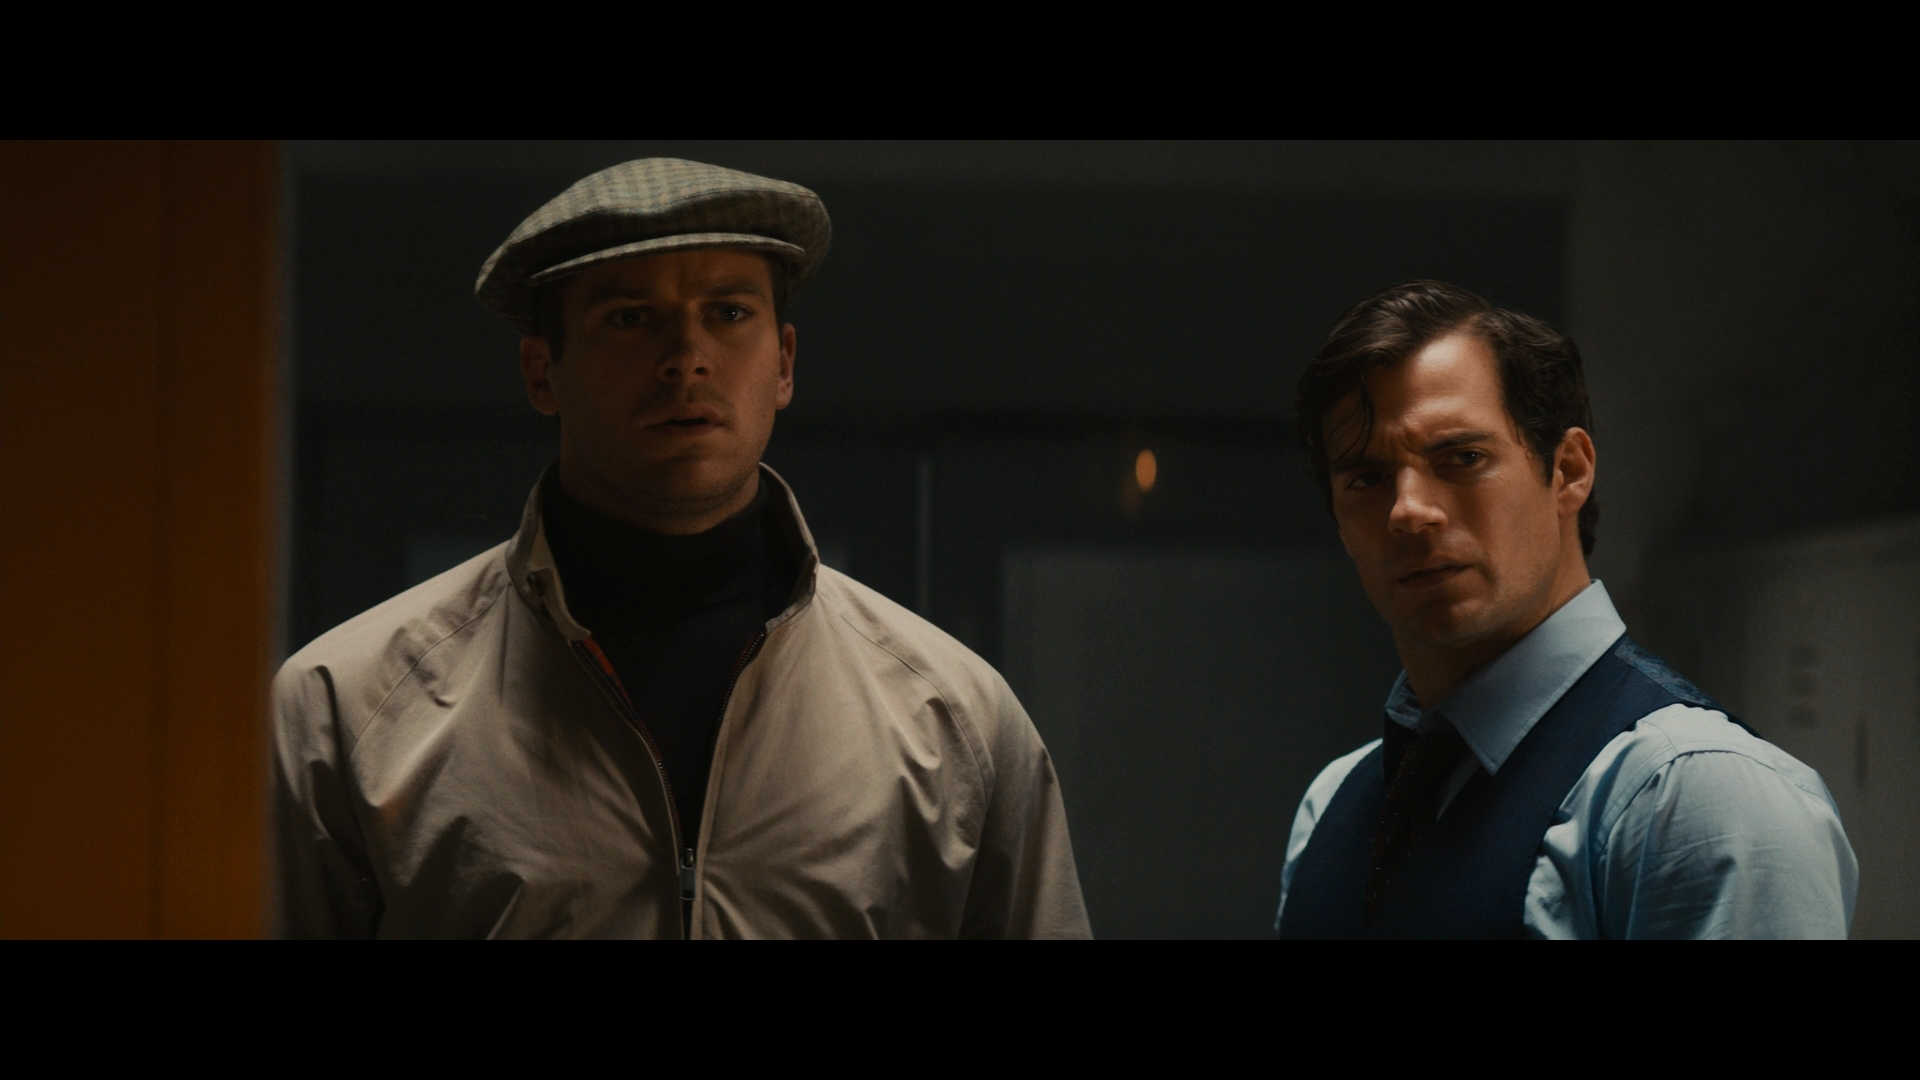 The Man From U.N.C.L.E. Blu-ray Review | High Def Digest